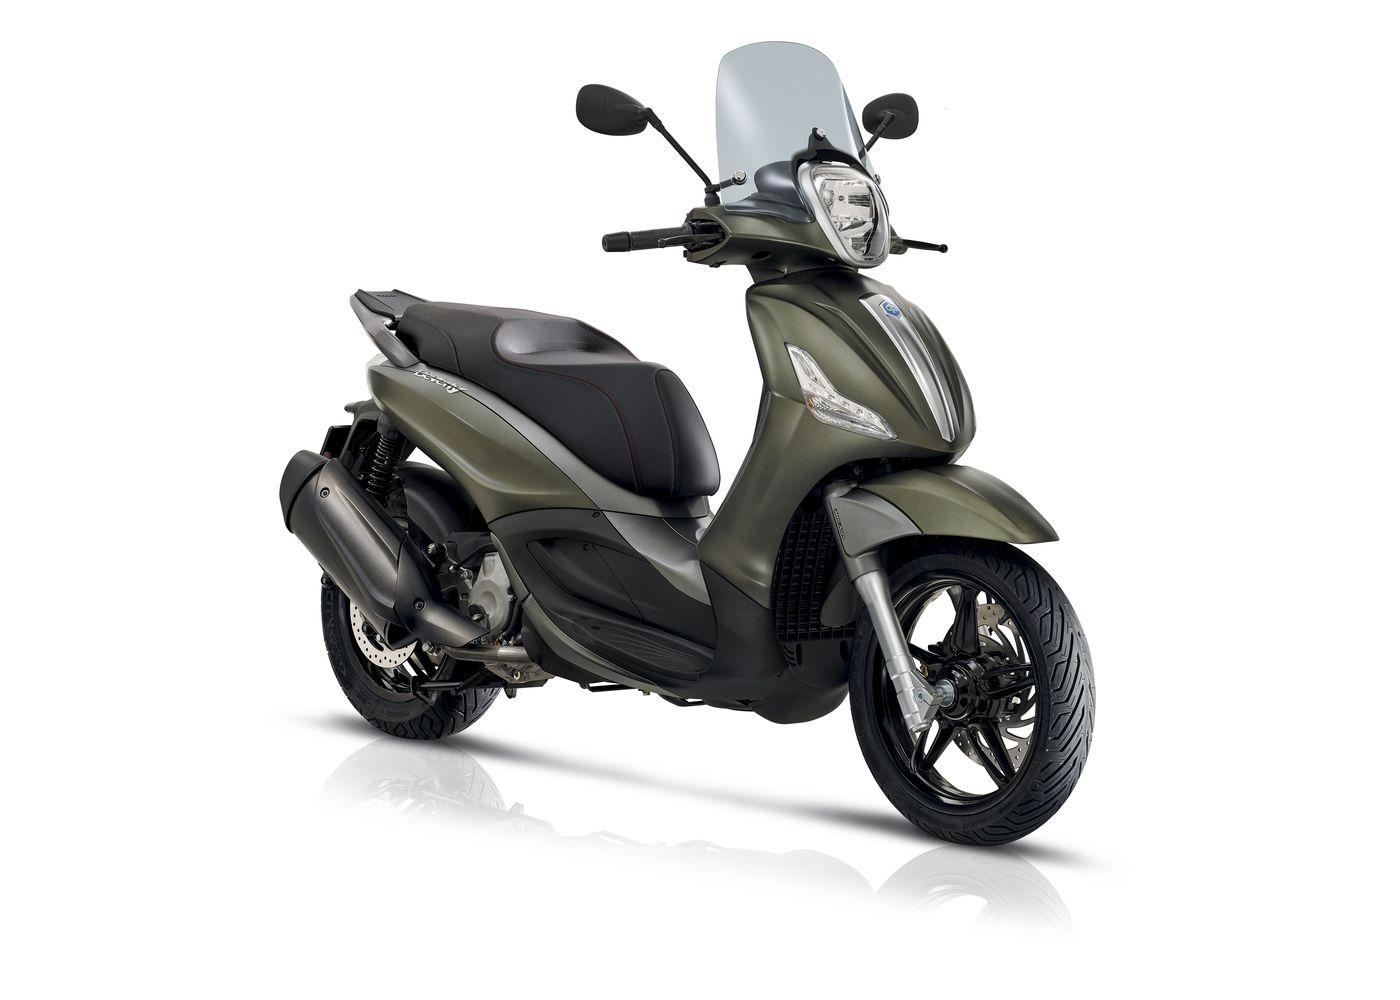 PIAGGIO BEVERLY 300/350 DESDE 3.818€